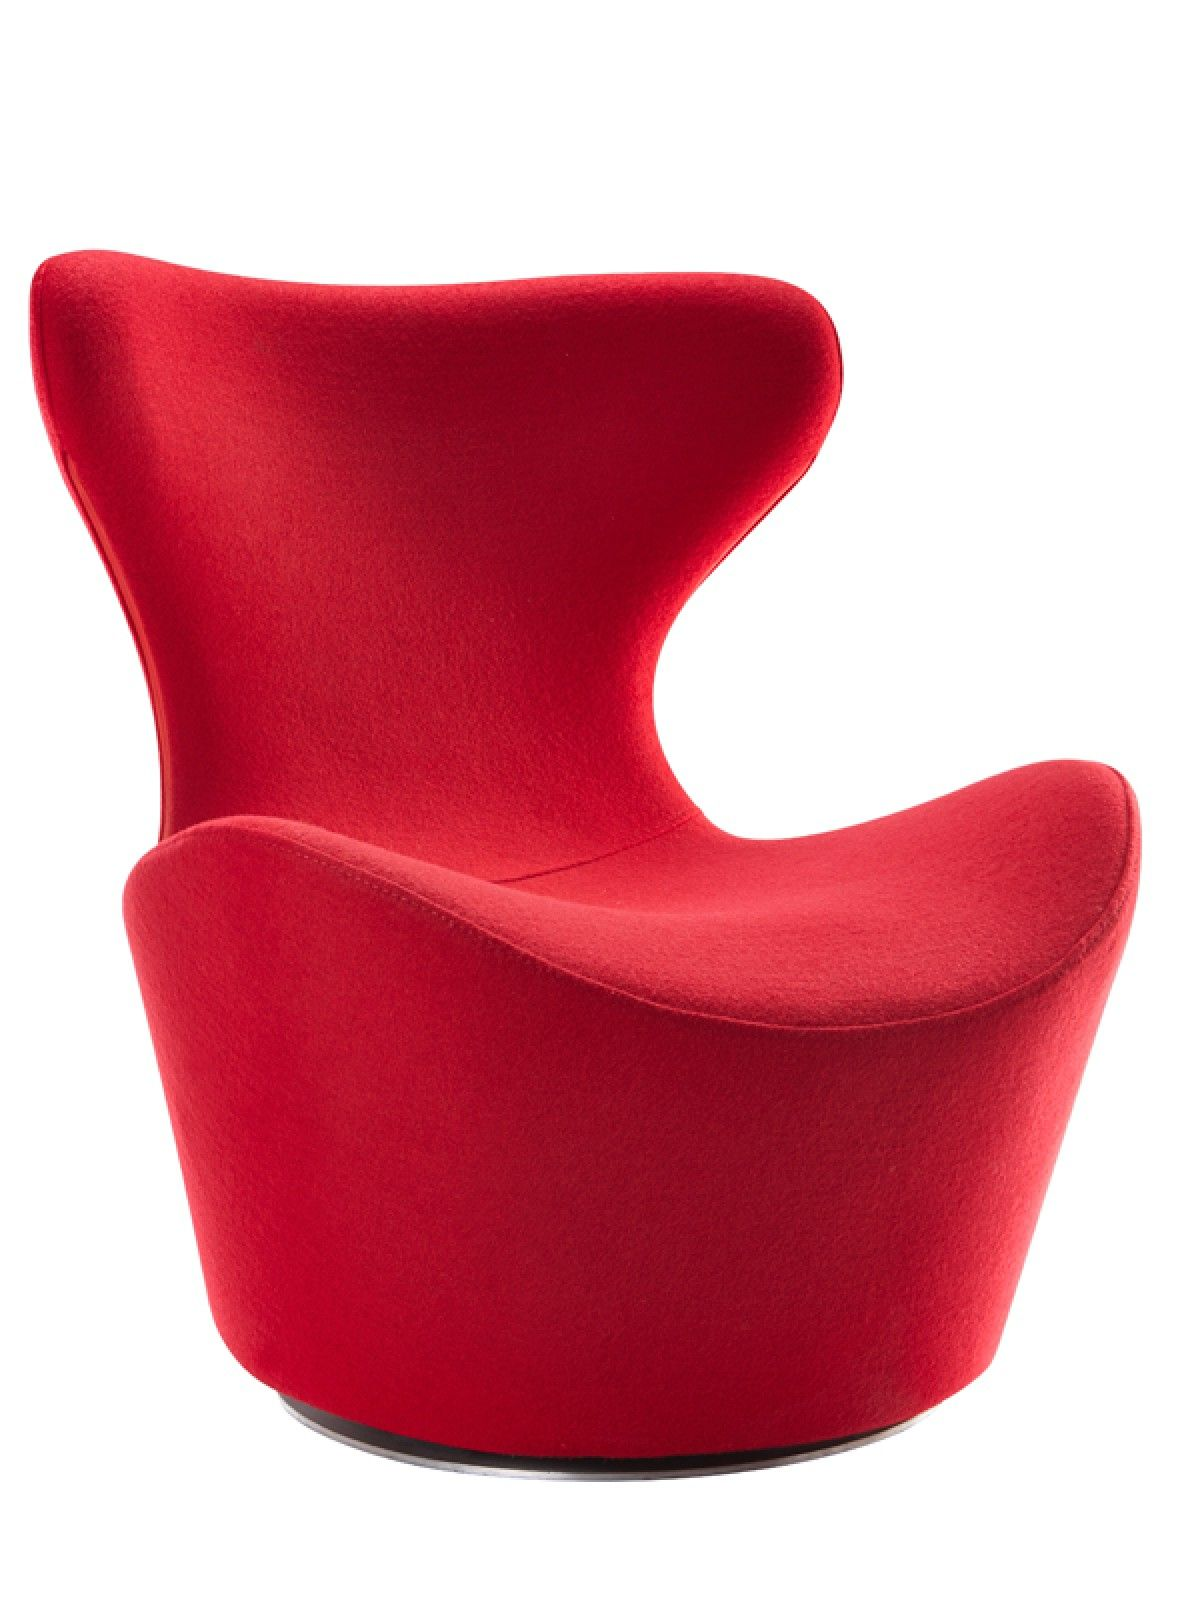 modrest hadrian modern red fabric accent chair  lounge  lounge  - modrest hadrian modern red fabric accent chair  lounge  lounge seating